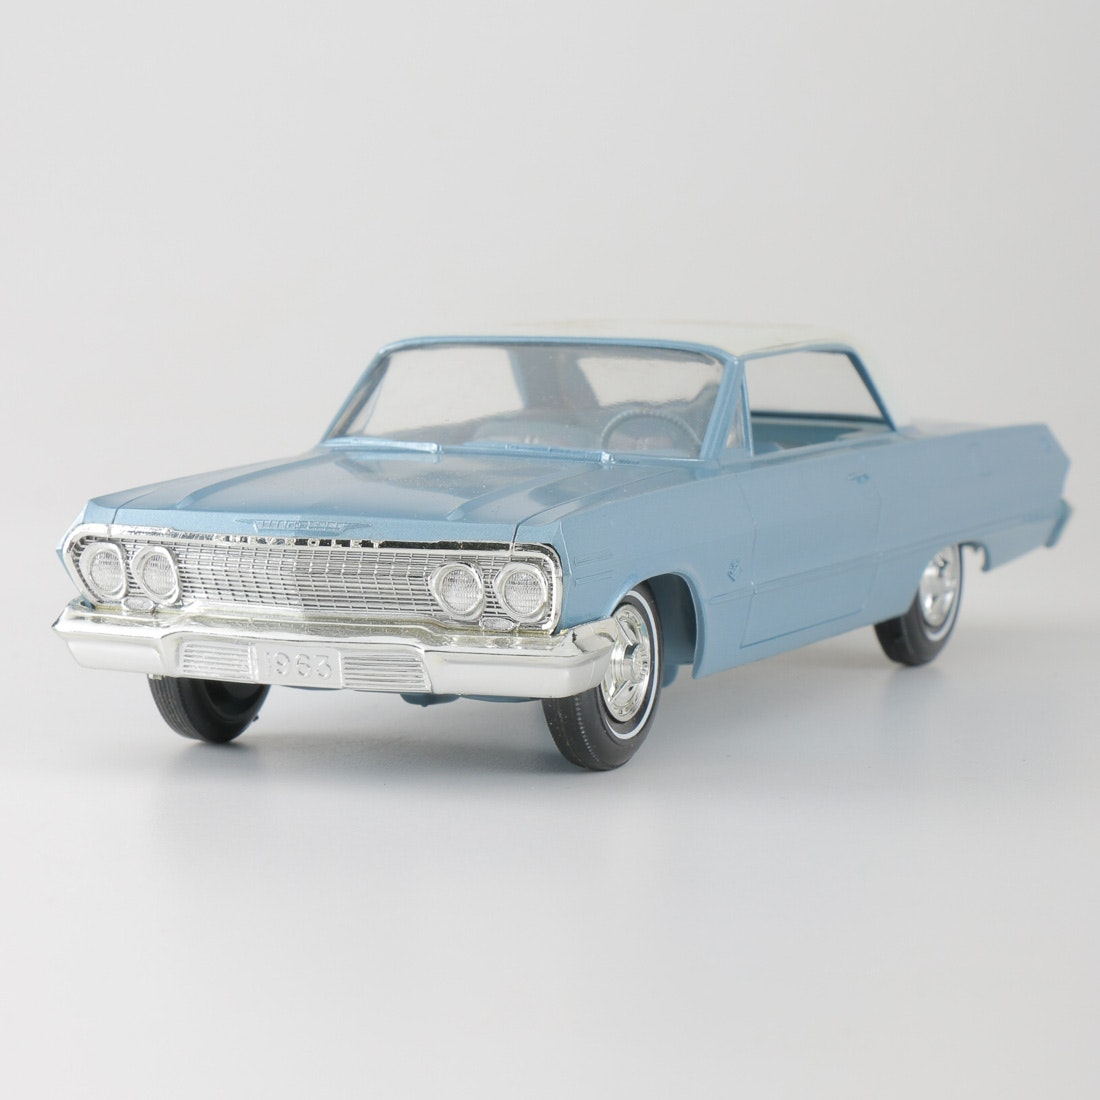 1963 Chevrolet Impala SS Promo